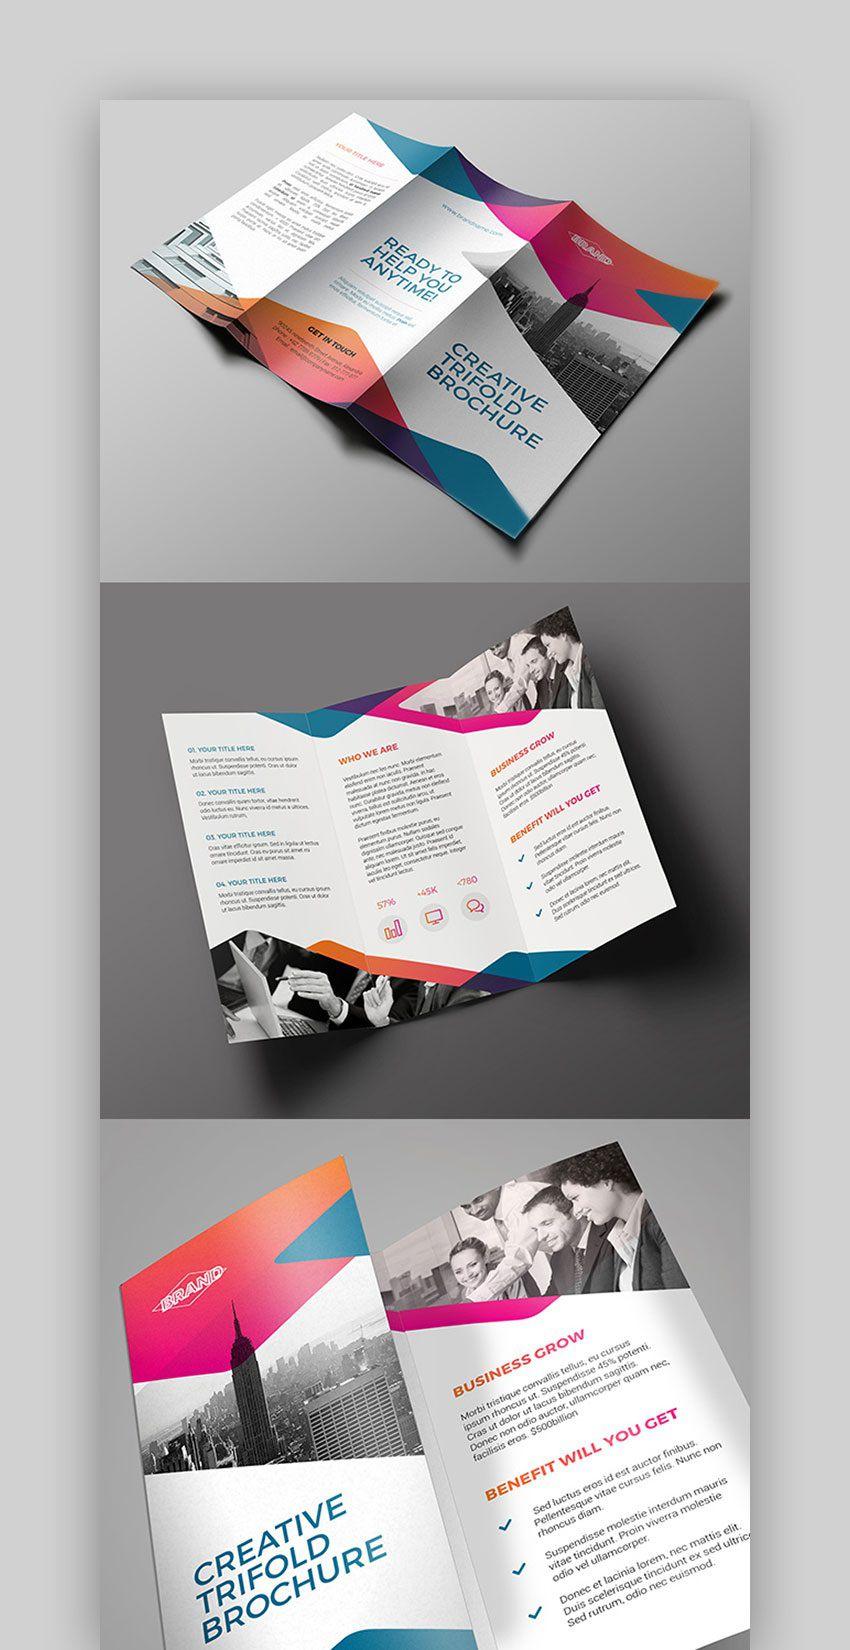 008 Amazing Indesign Trifold Brochure Template Picture  Tri Fold A4 Bi Free DownloadFull